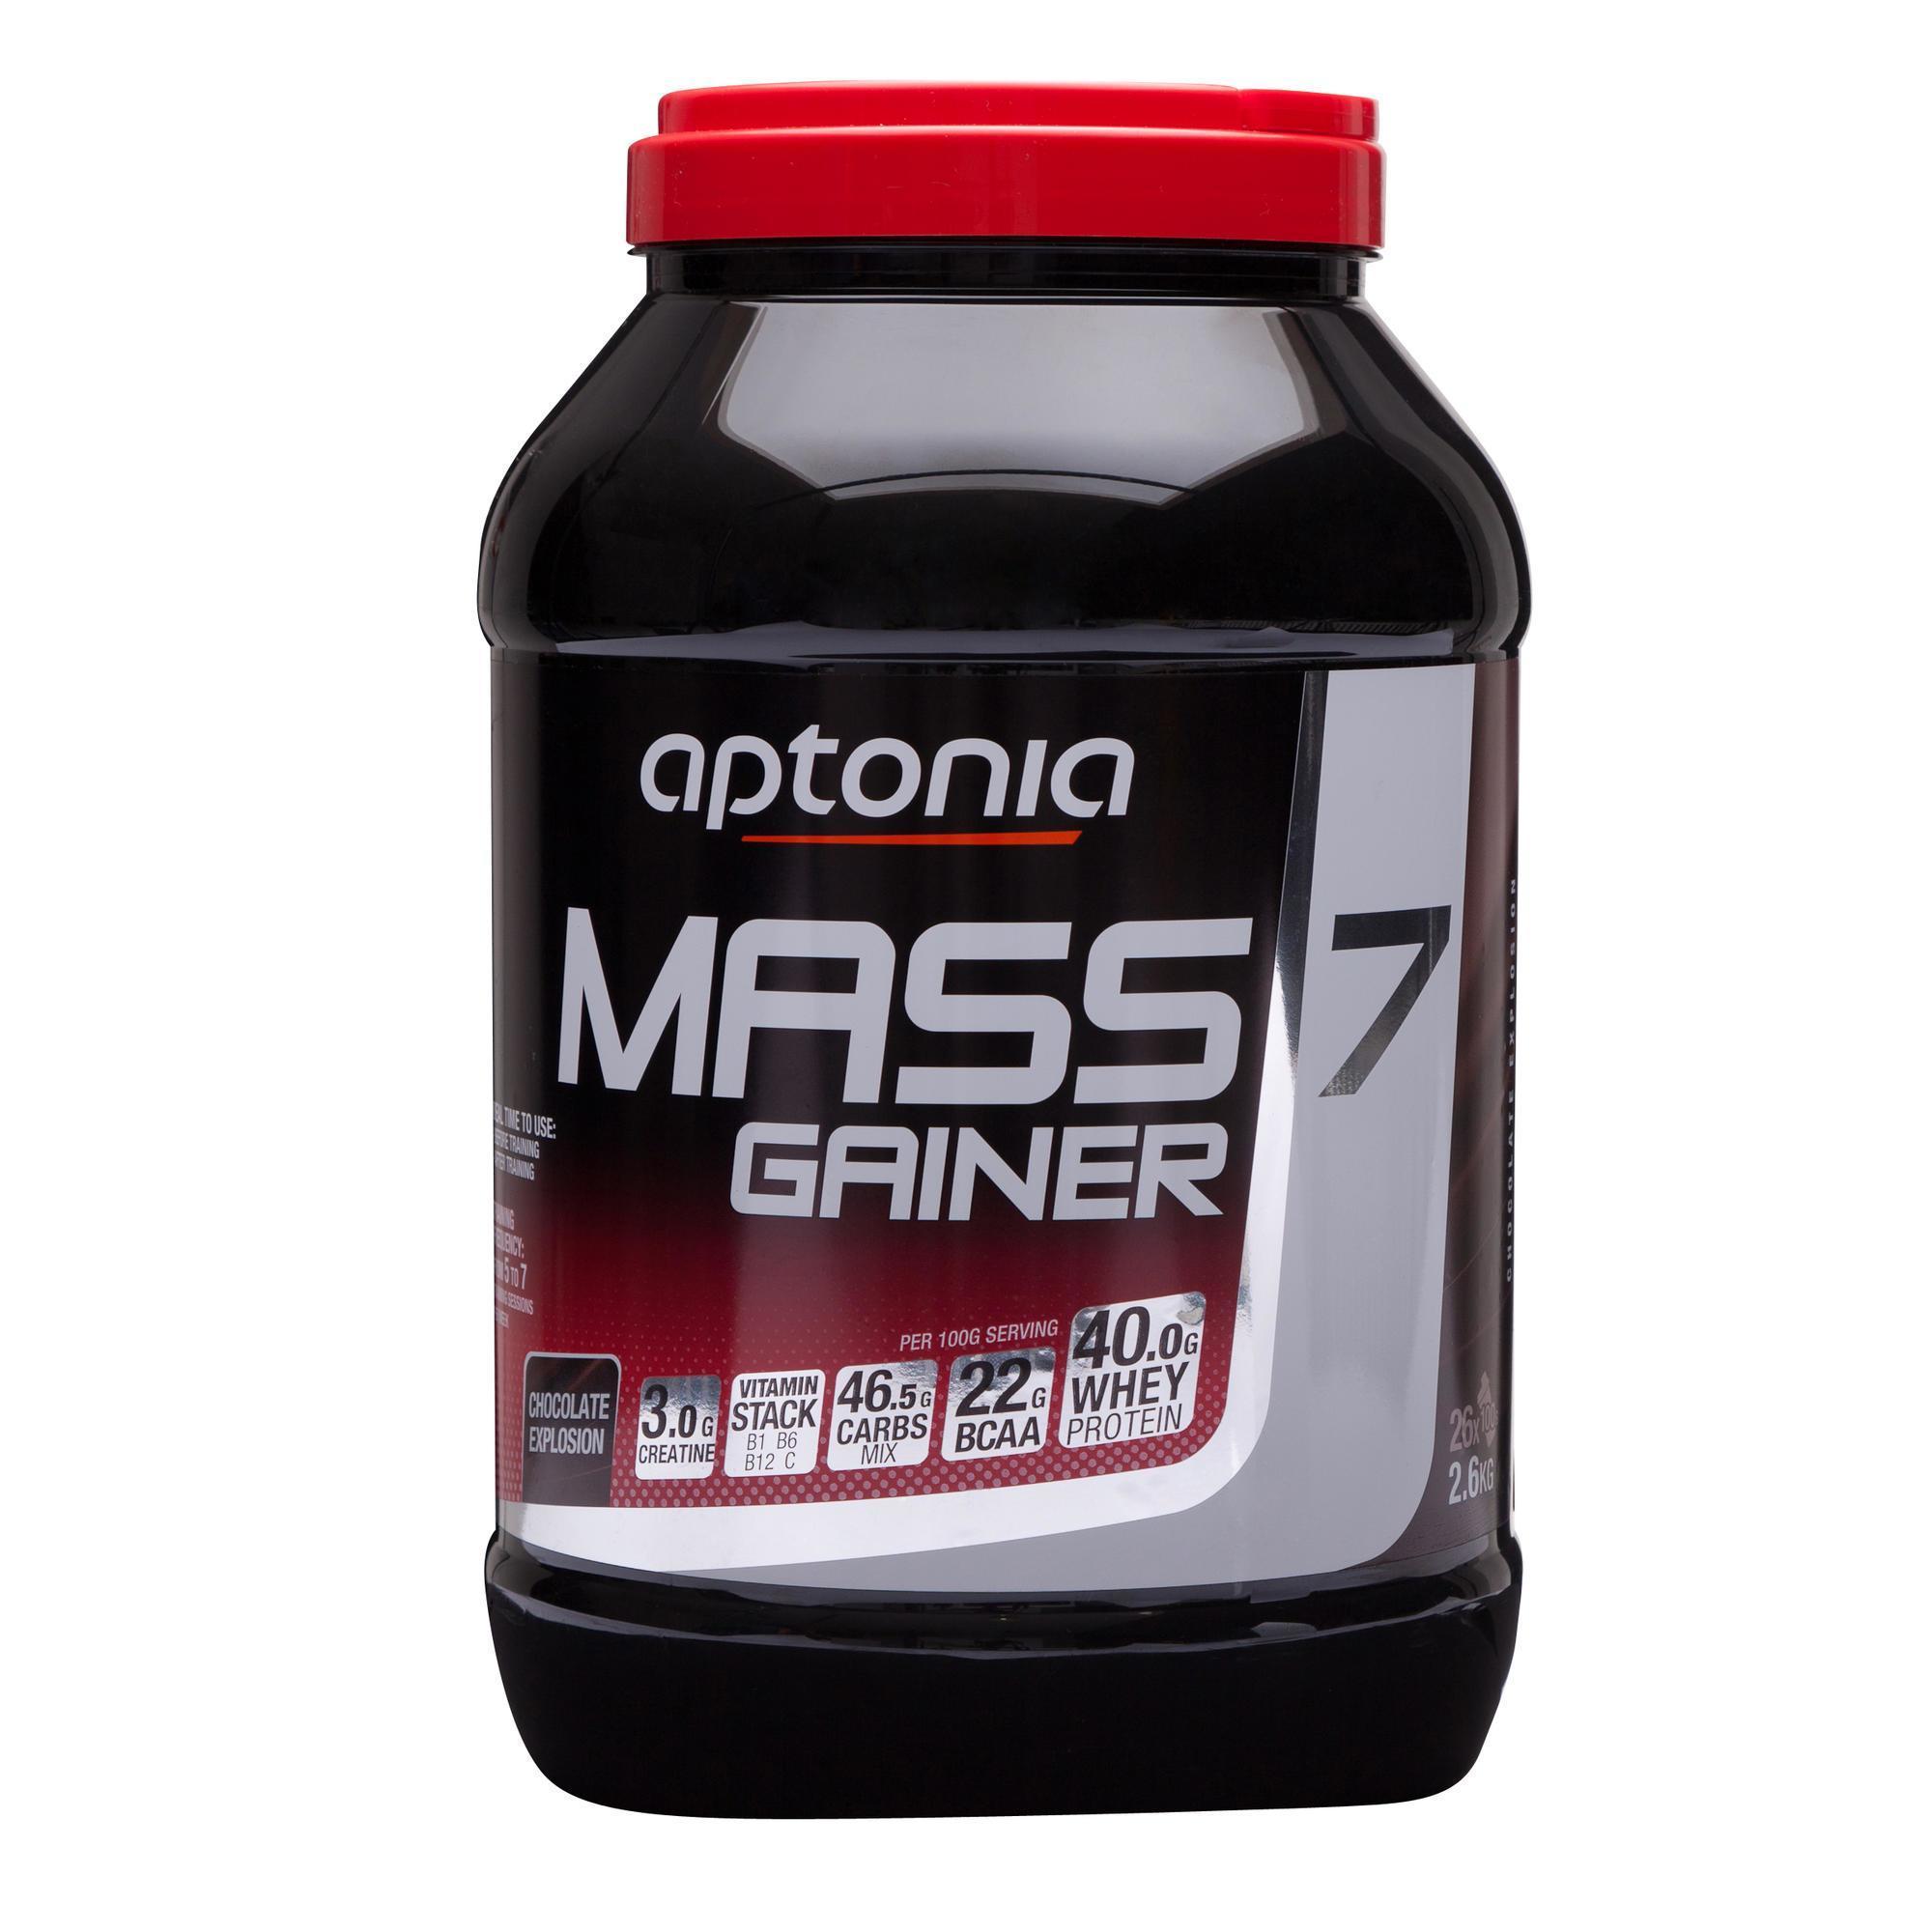 Mass Gainer 7 Schoko 2,6kg